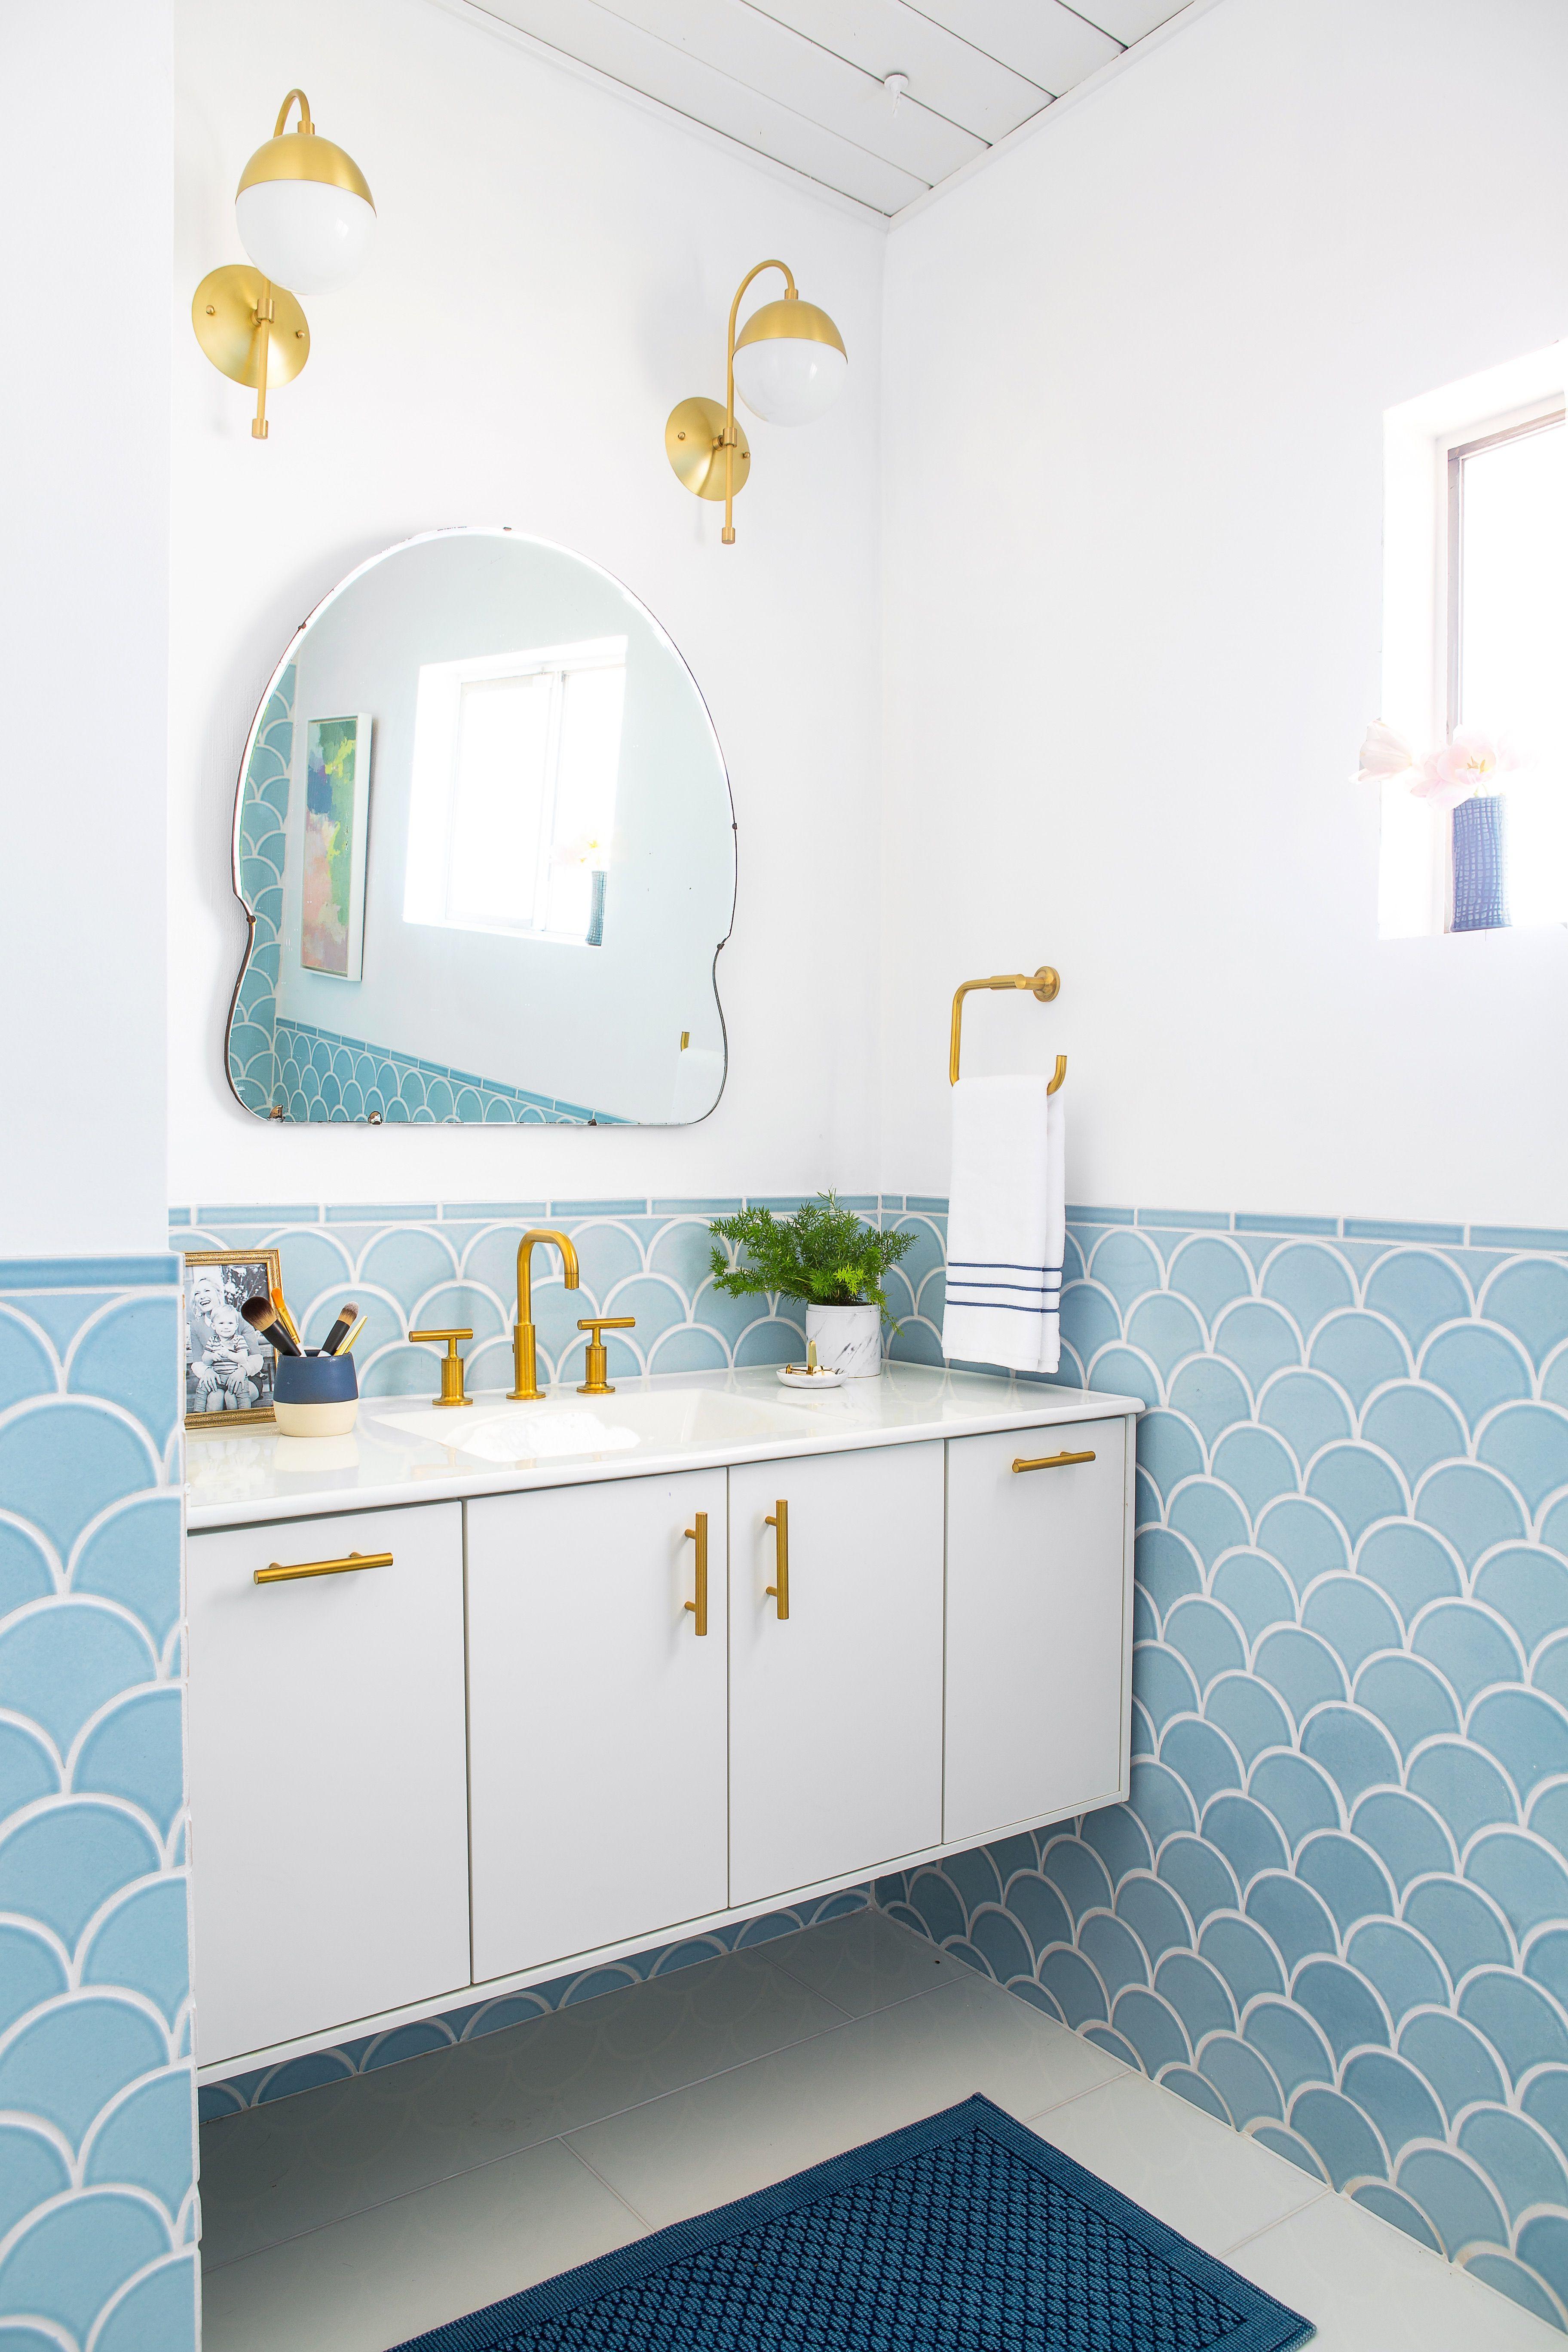 Design bathroom tiles 30+ bathroom tile design ideas - tile backsplash and floor designs for  bathrooms BAWLHYU